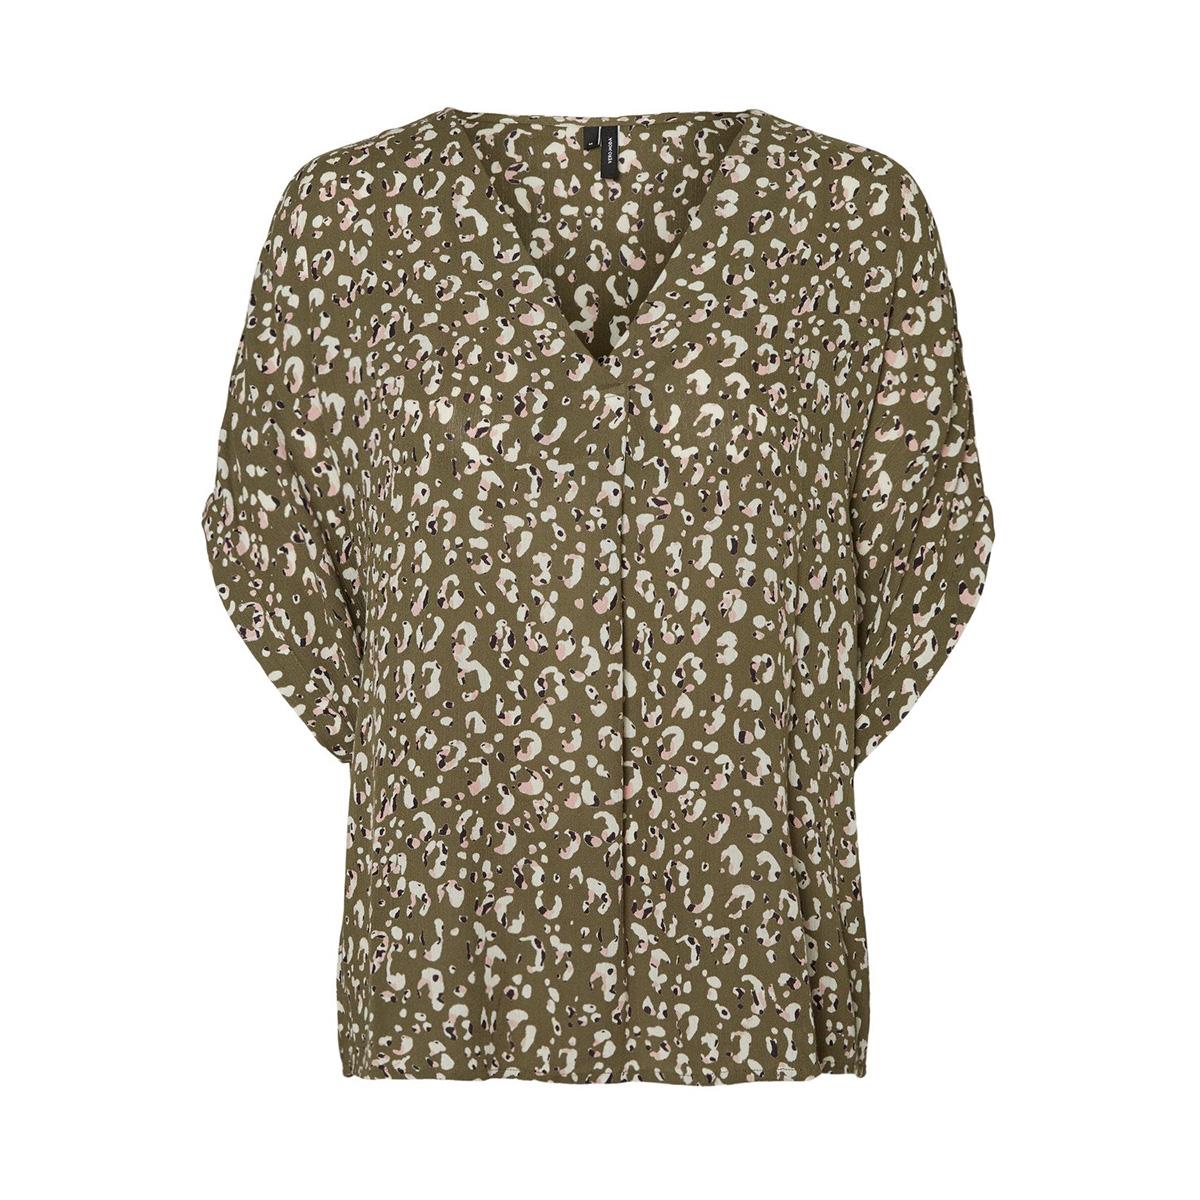 vmamsterdam s/s top exp 10218212 vero moda t-shirt ivy green/klaudia